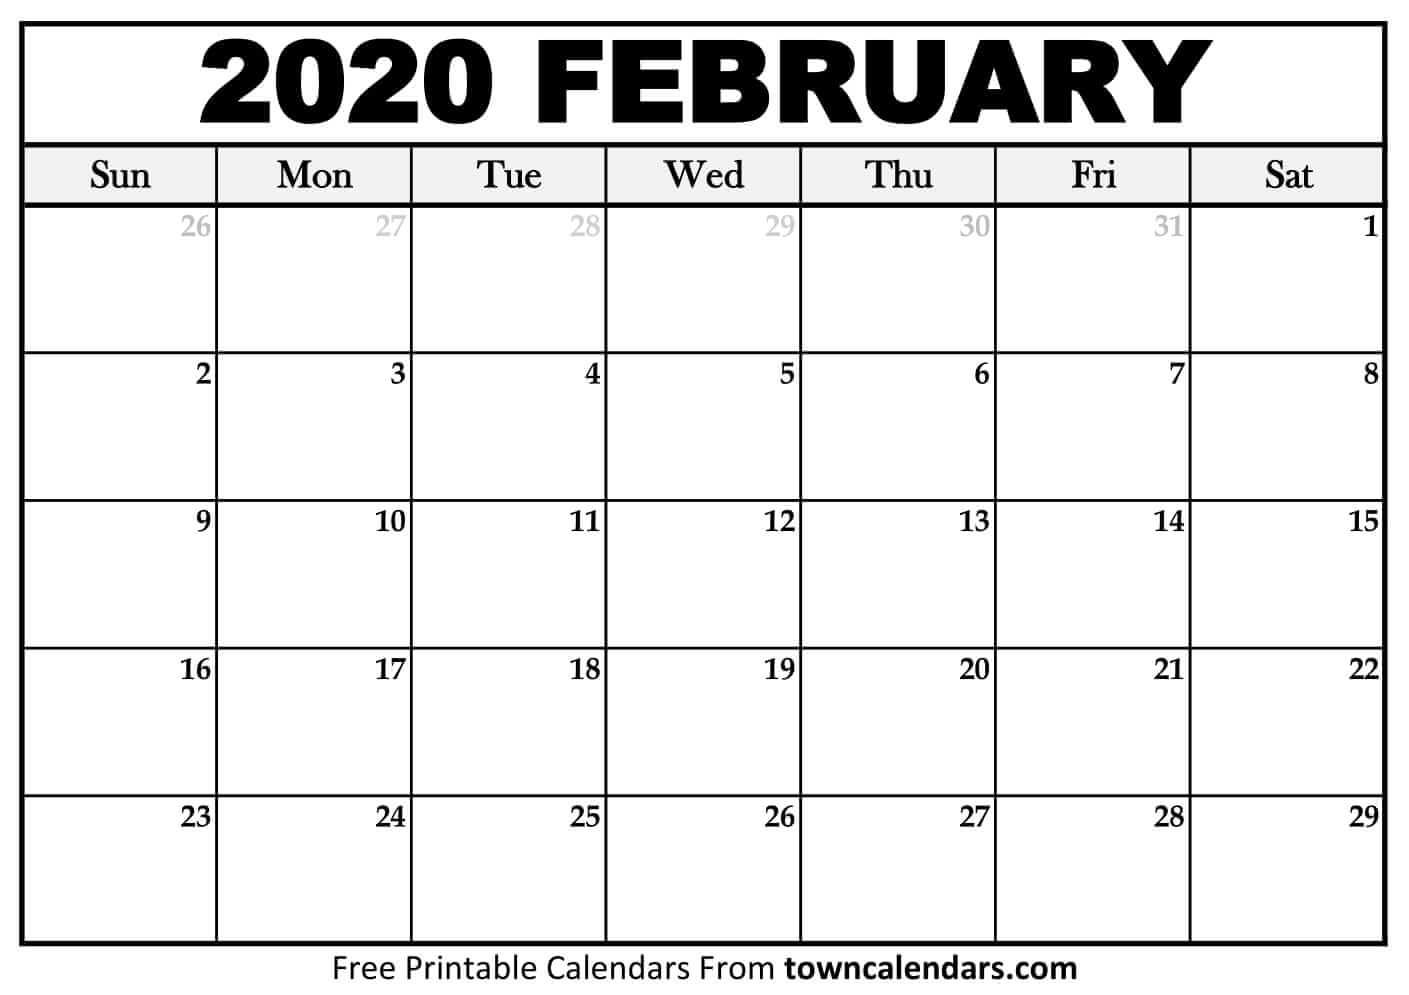 Printable February 2020 Calendar - Towncalendars